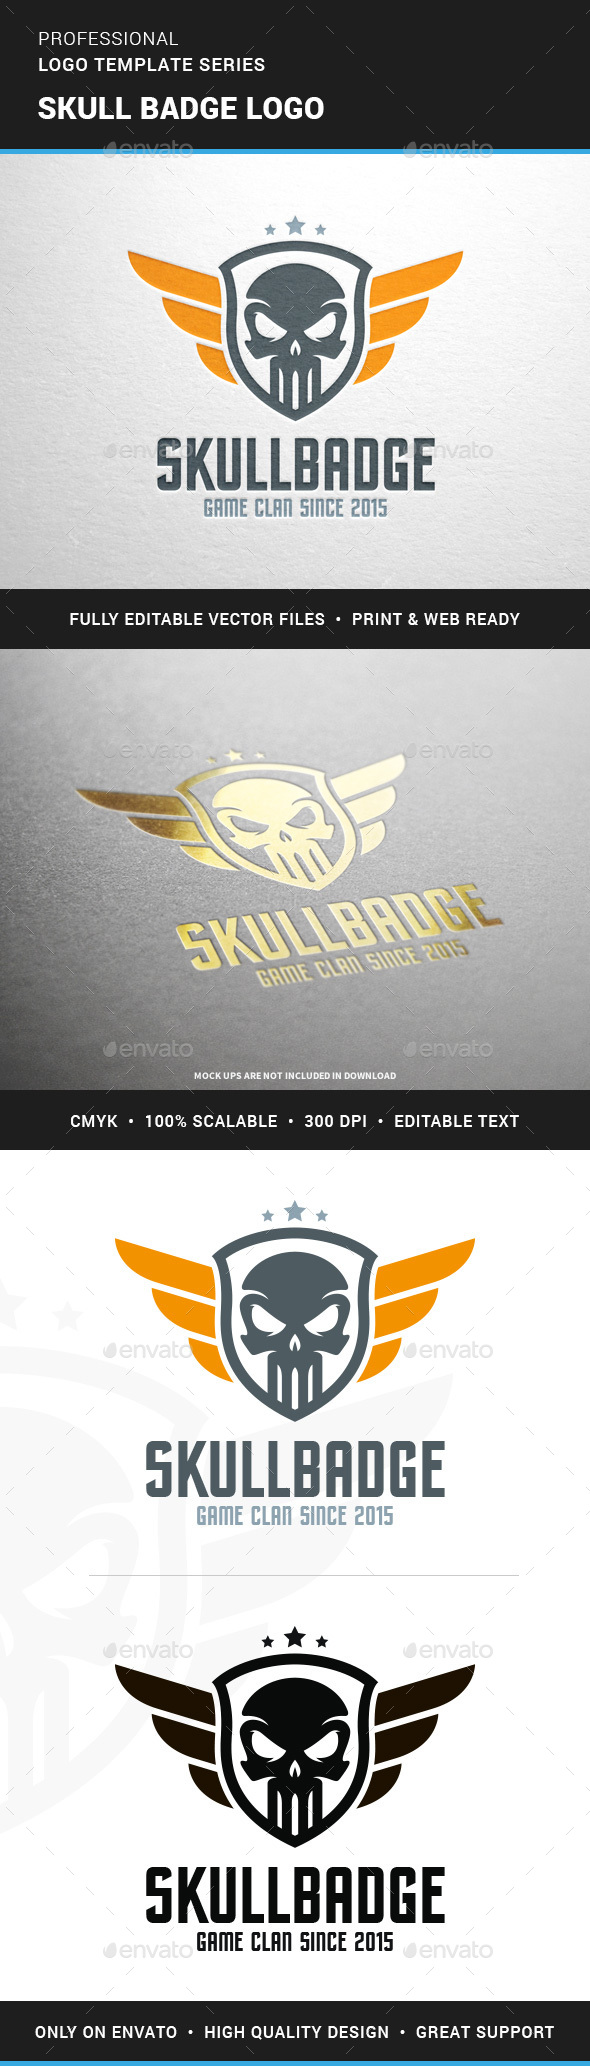 Skull Badge Logo Template - Crests Logo Templates